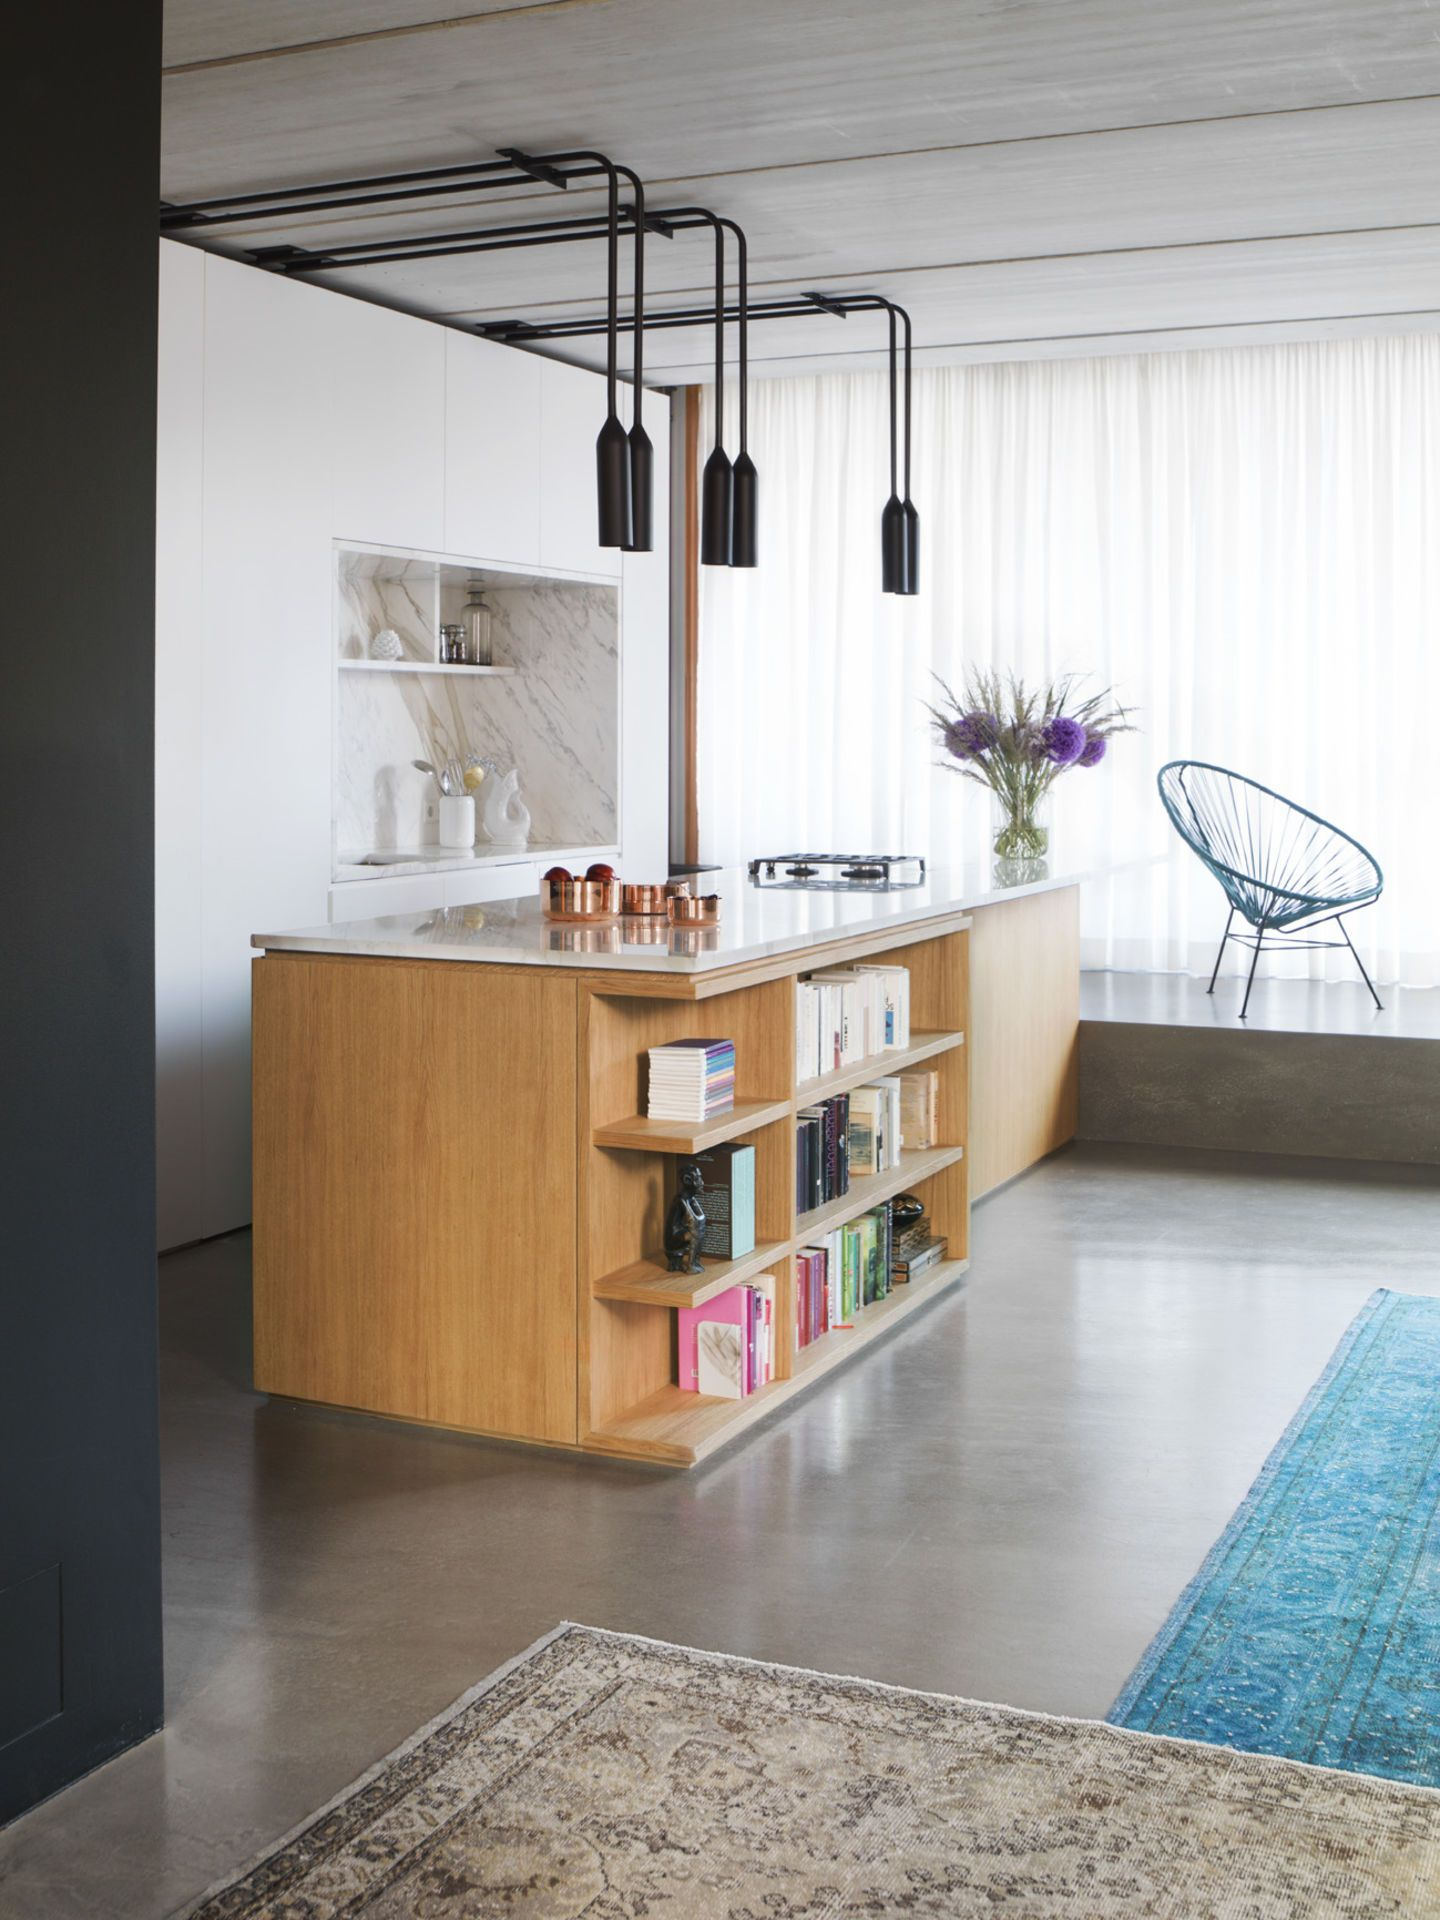 Bruzkus Batek Architekten Esters Apartment Berlin Germany  # Muebles Only Cali